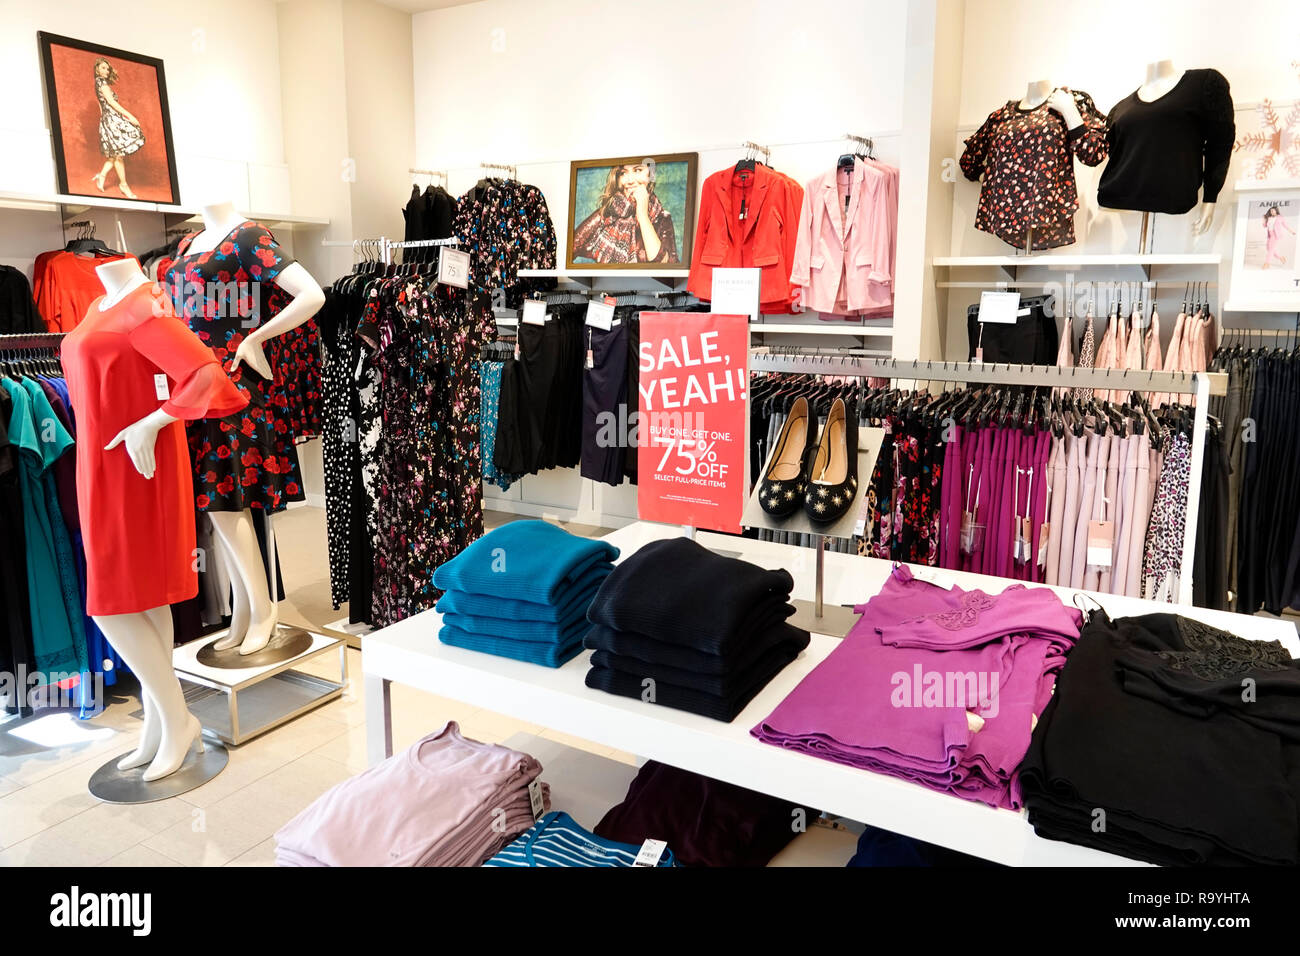 florida fort ft lauderdale pembroke pines shops at pembroke gardens mall lane bryant plus size womens clothing fashion inside interior displa R9YHTA - Banana Republic Shops At Pembroke Gardens